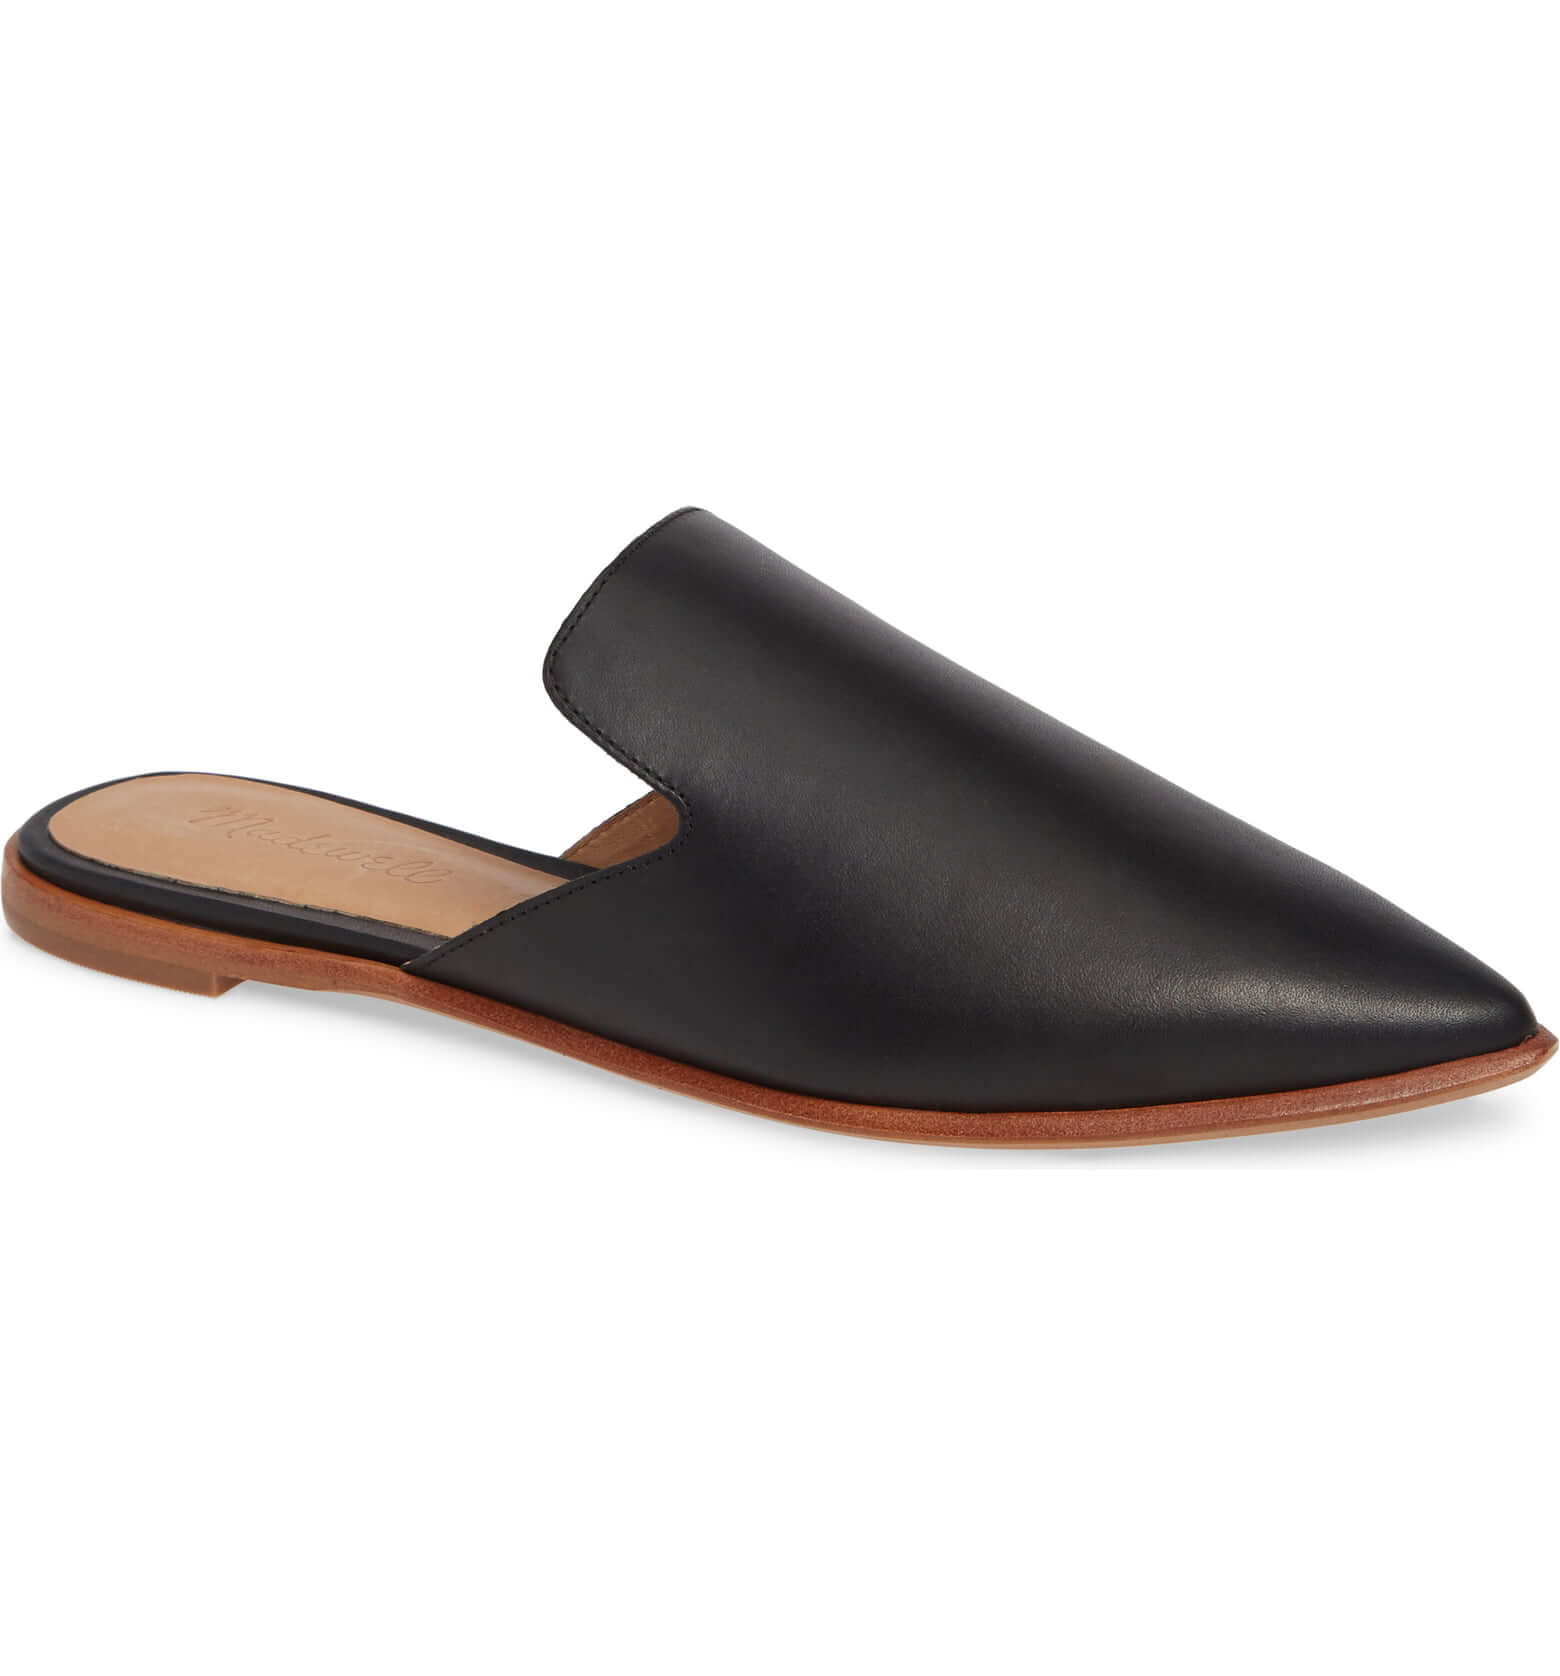 madewell-shoes-the-gemma-mule.jpeg